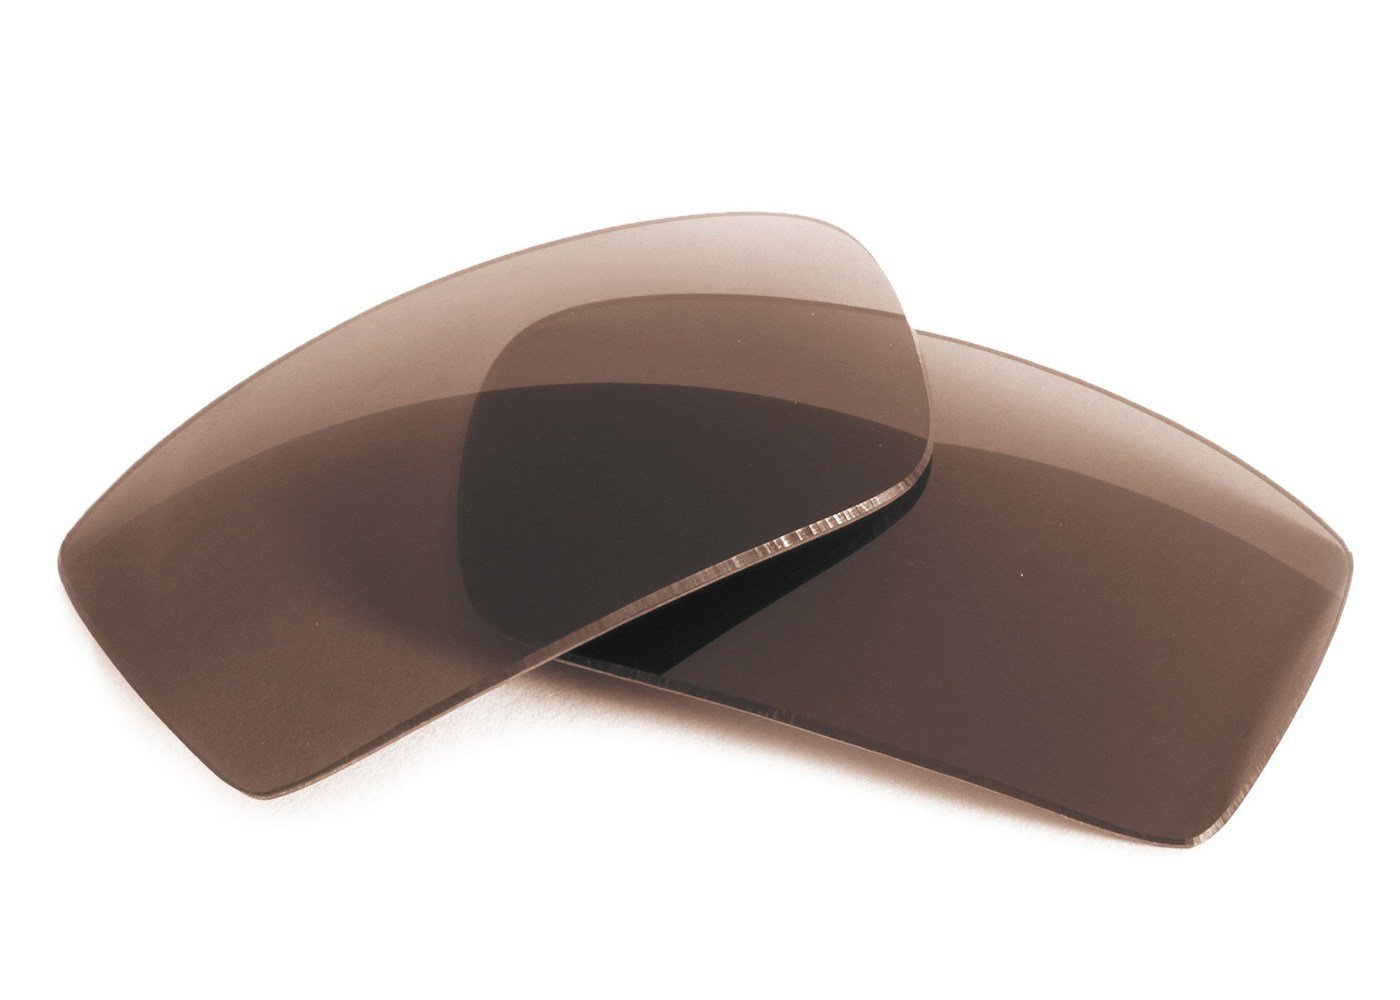 Fuse Lenses for Maui Jim Castaway MJ-187 - Brown Polarized by Fuse Lenses